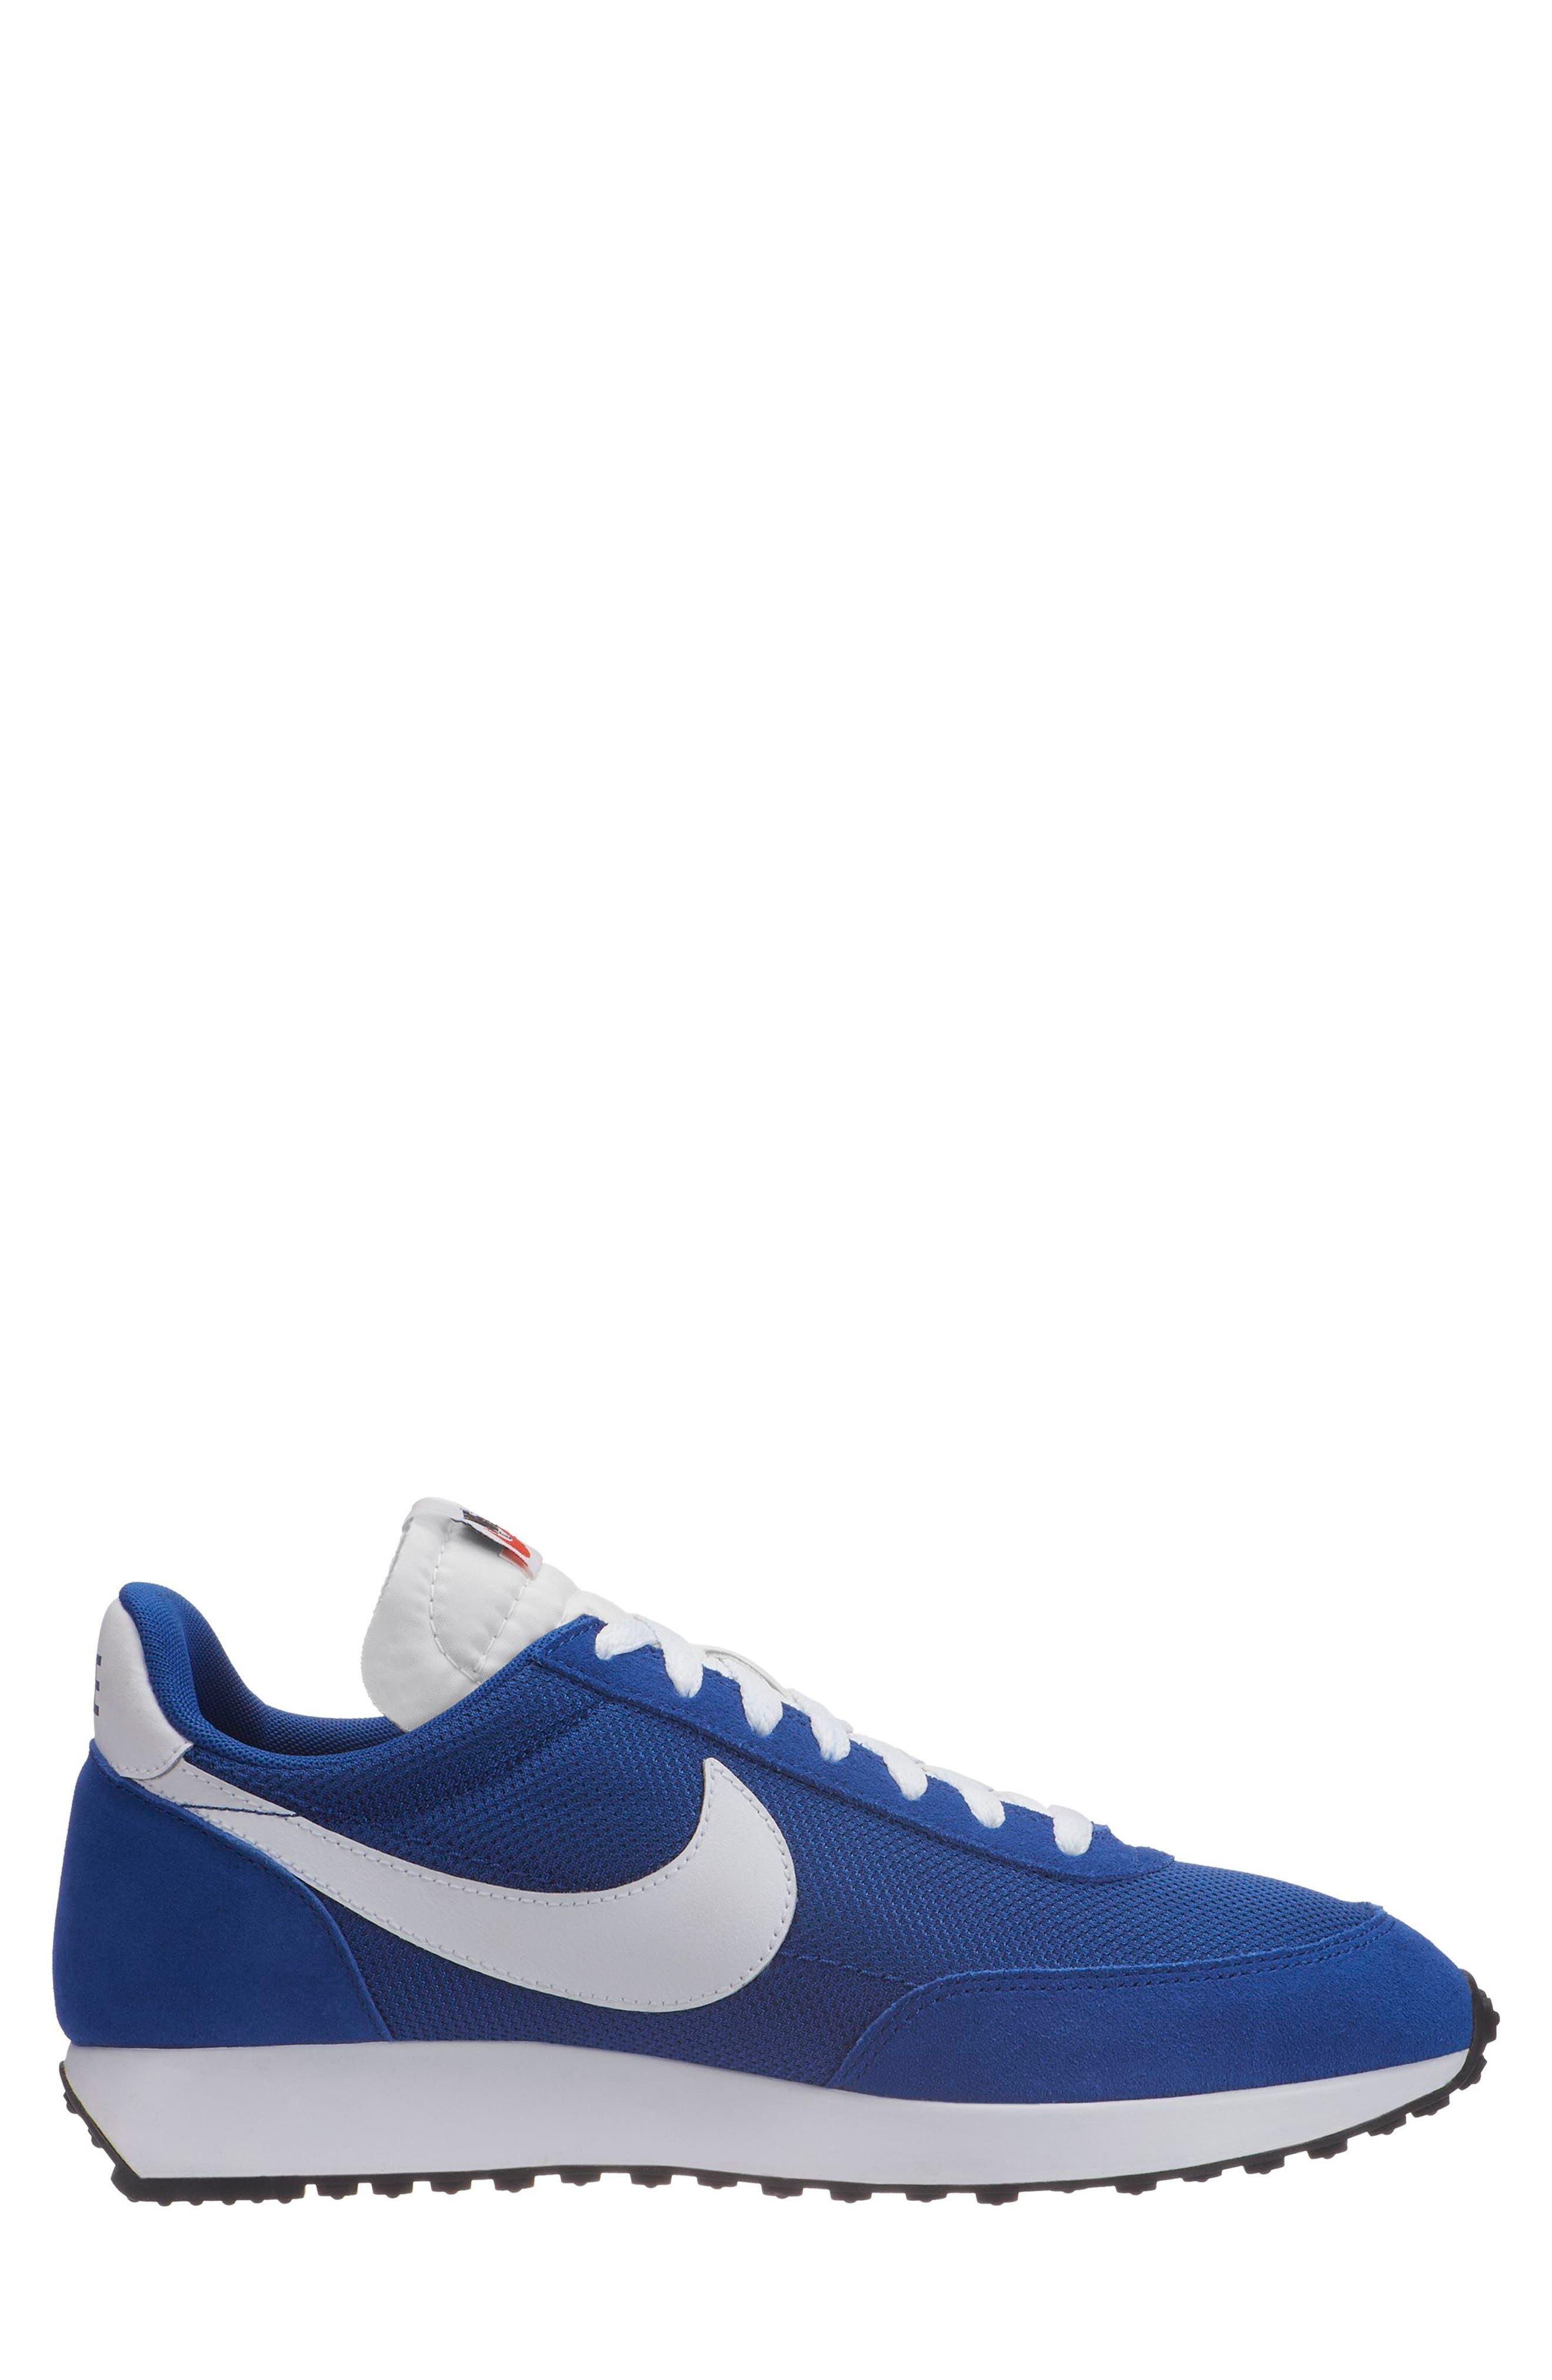 NIKE Air Tailwind '79 Sneaker, Main, color, 405